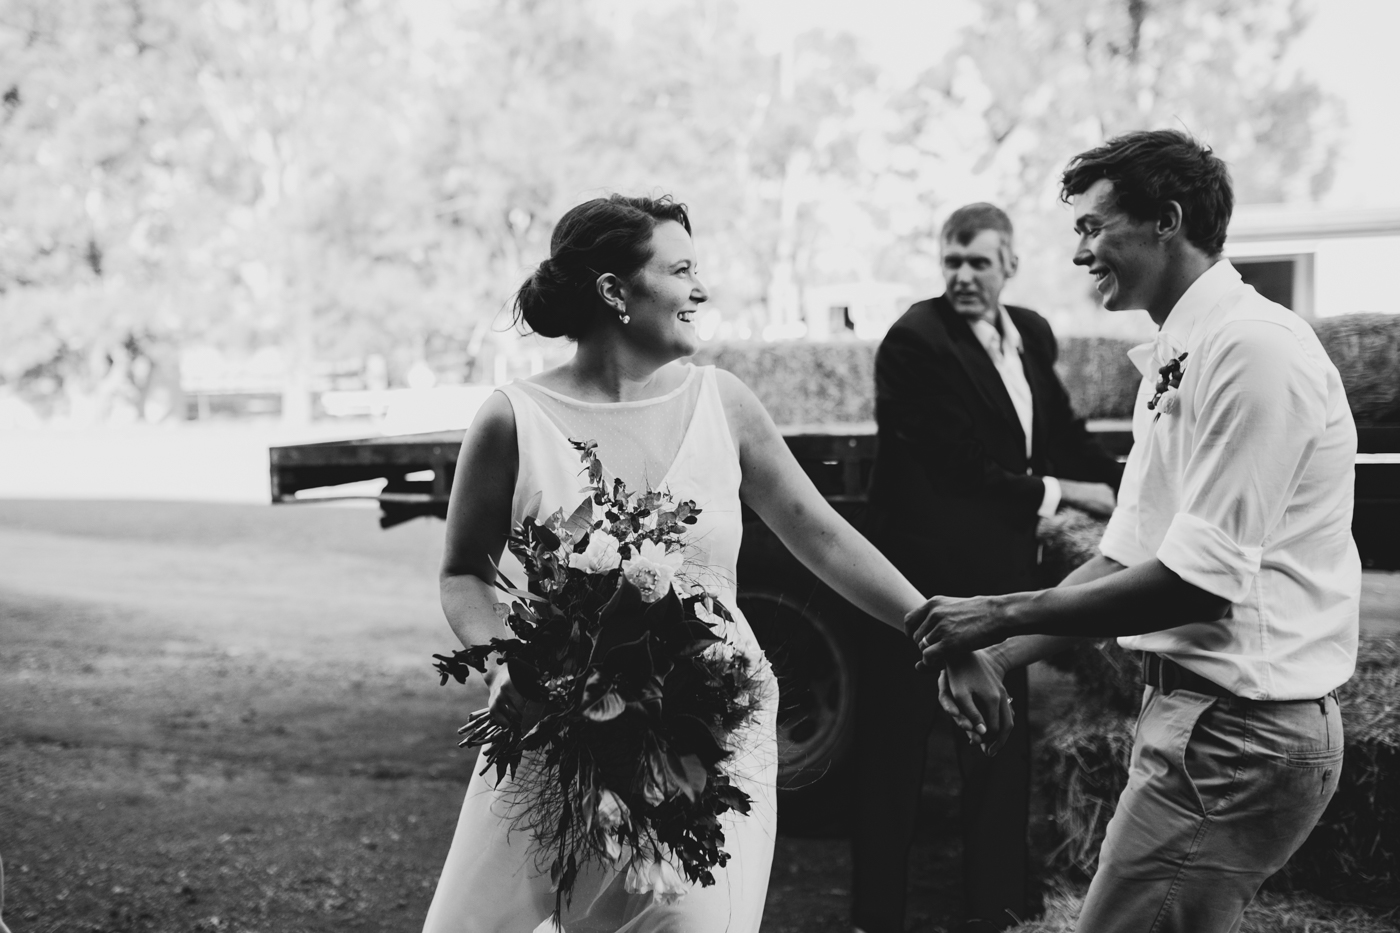 Nicolle & Jacob - Dubbo Wedding - Country Australia - Samantha Heather Photography-213.jpg